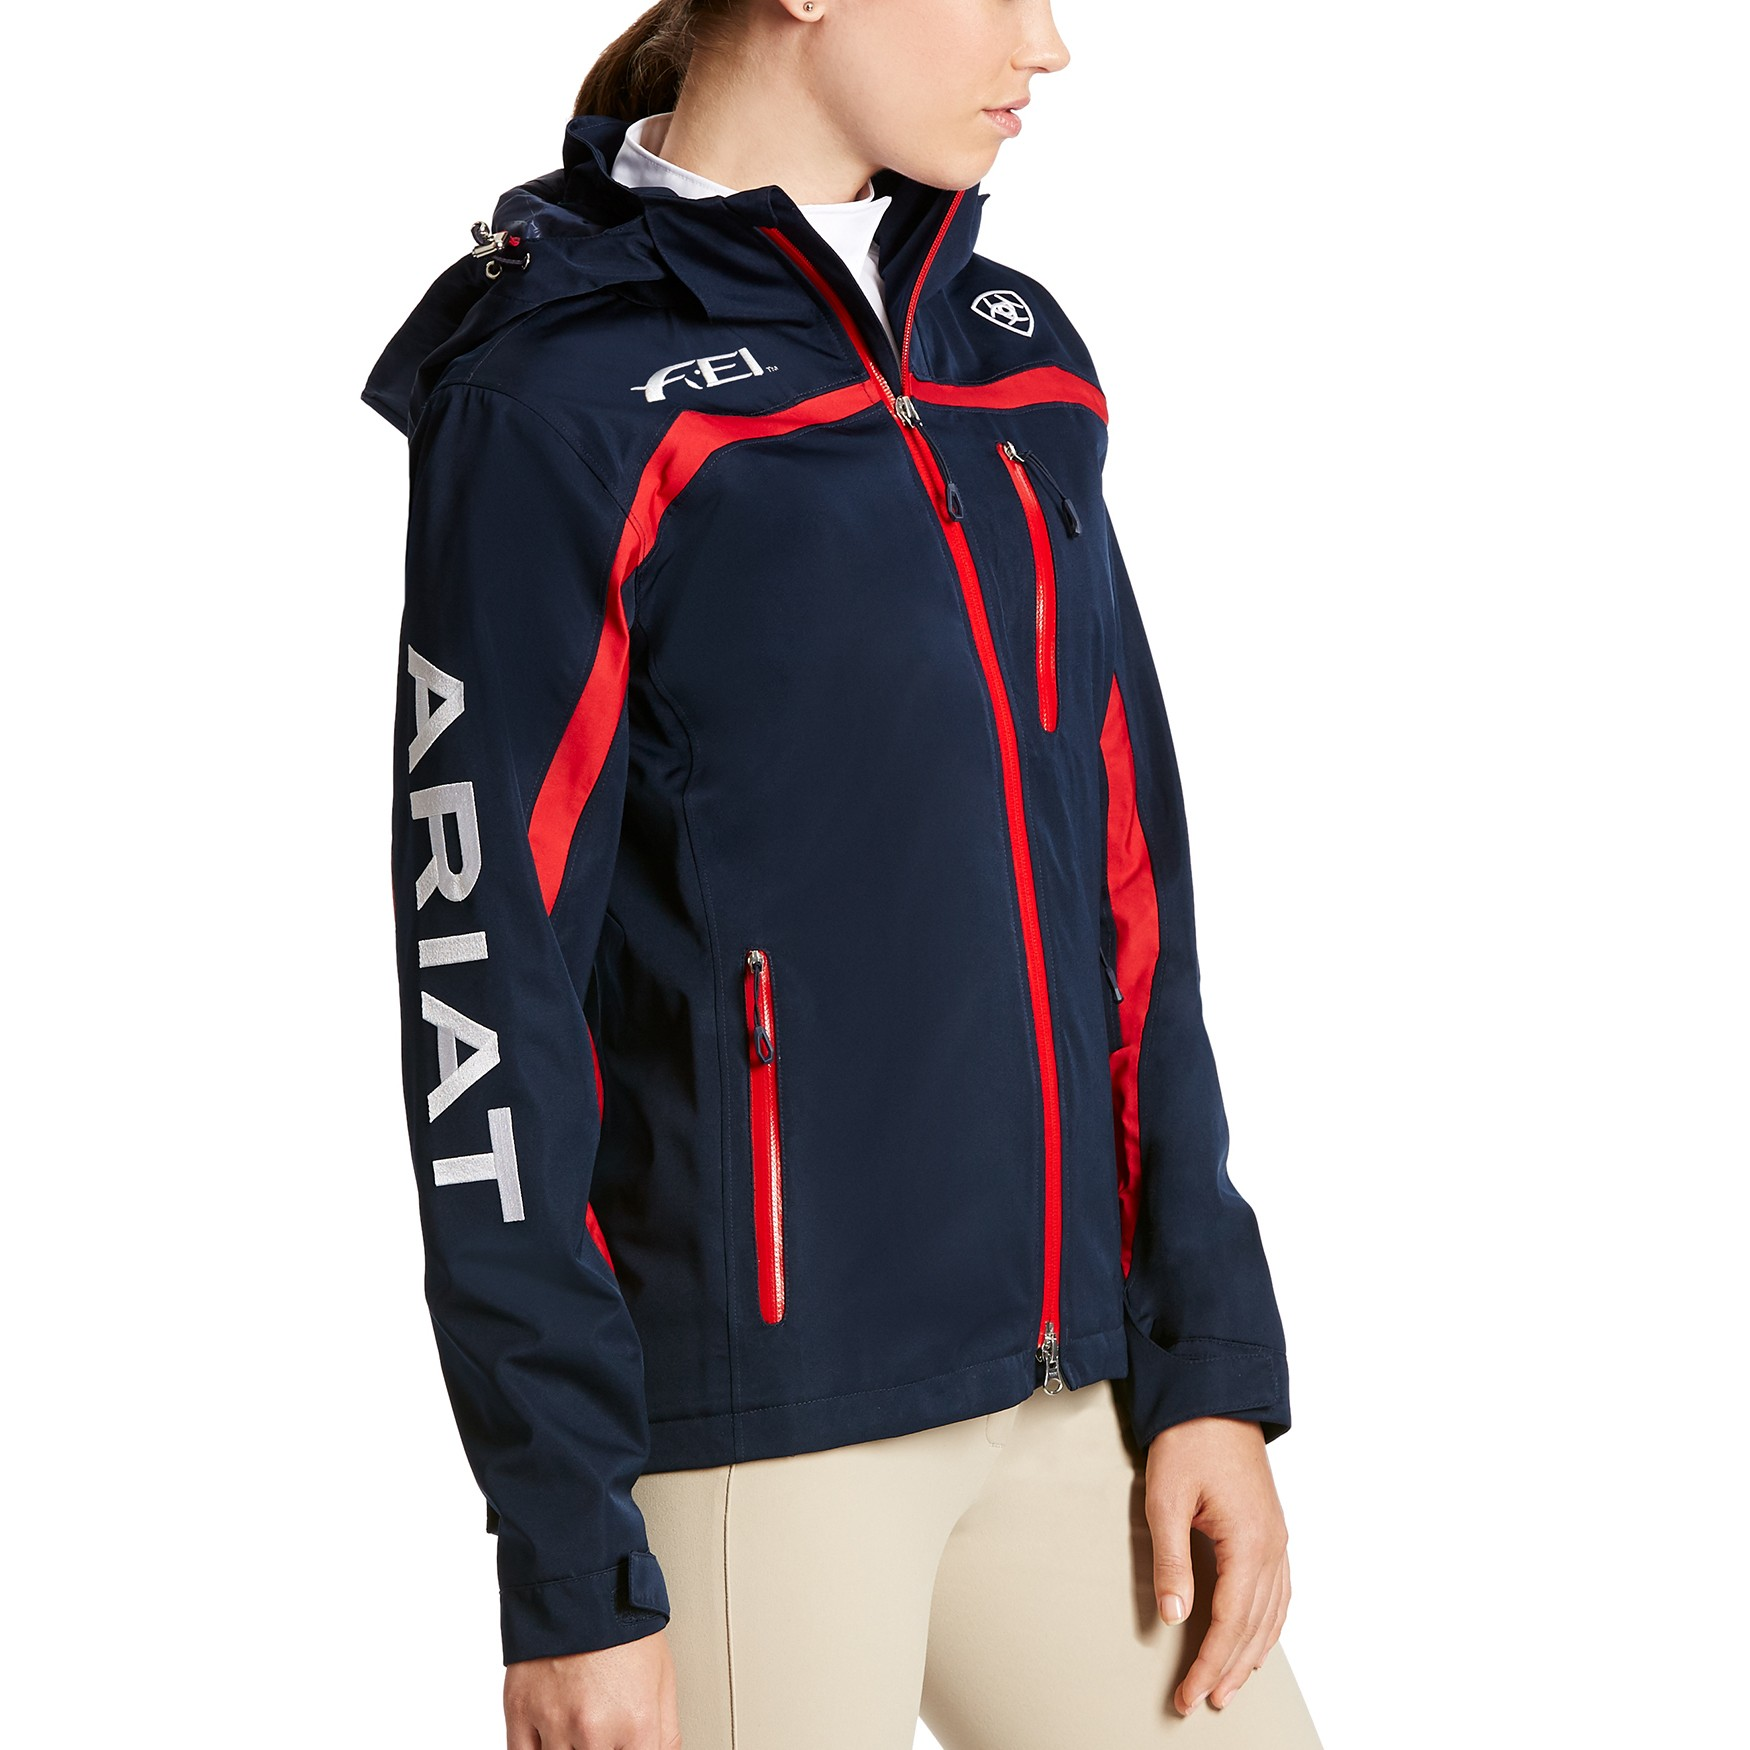 Ariat Women S Fei Team Ii Waterproof Jacket Wychanger Barton